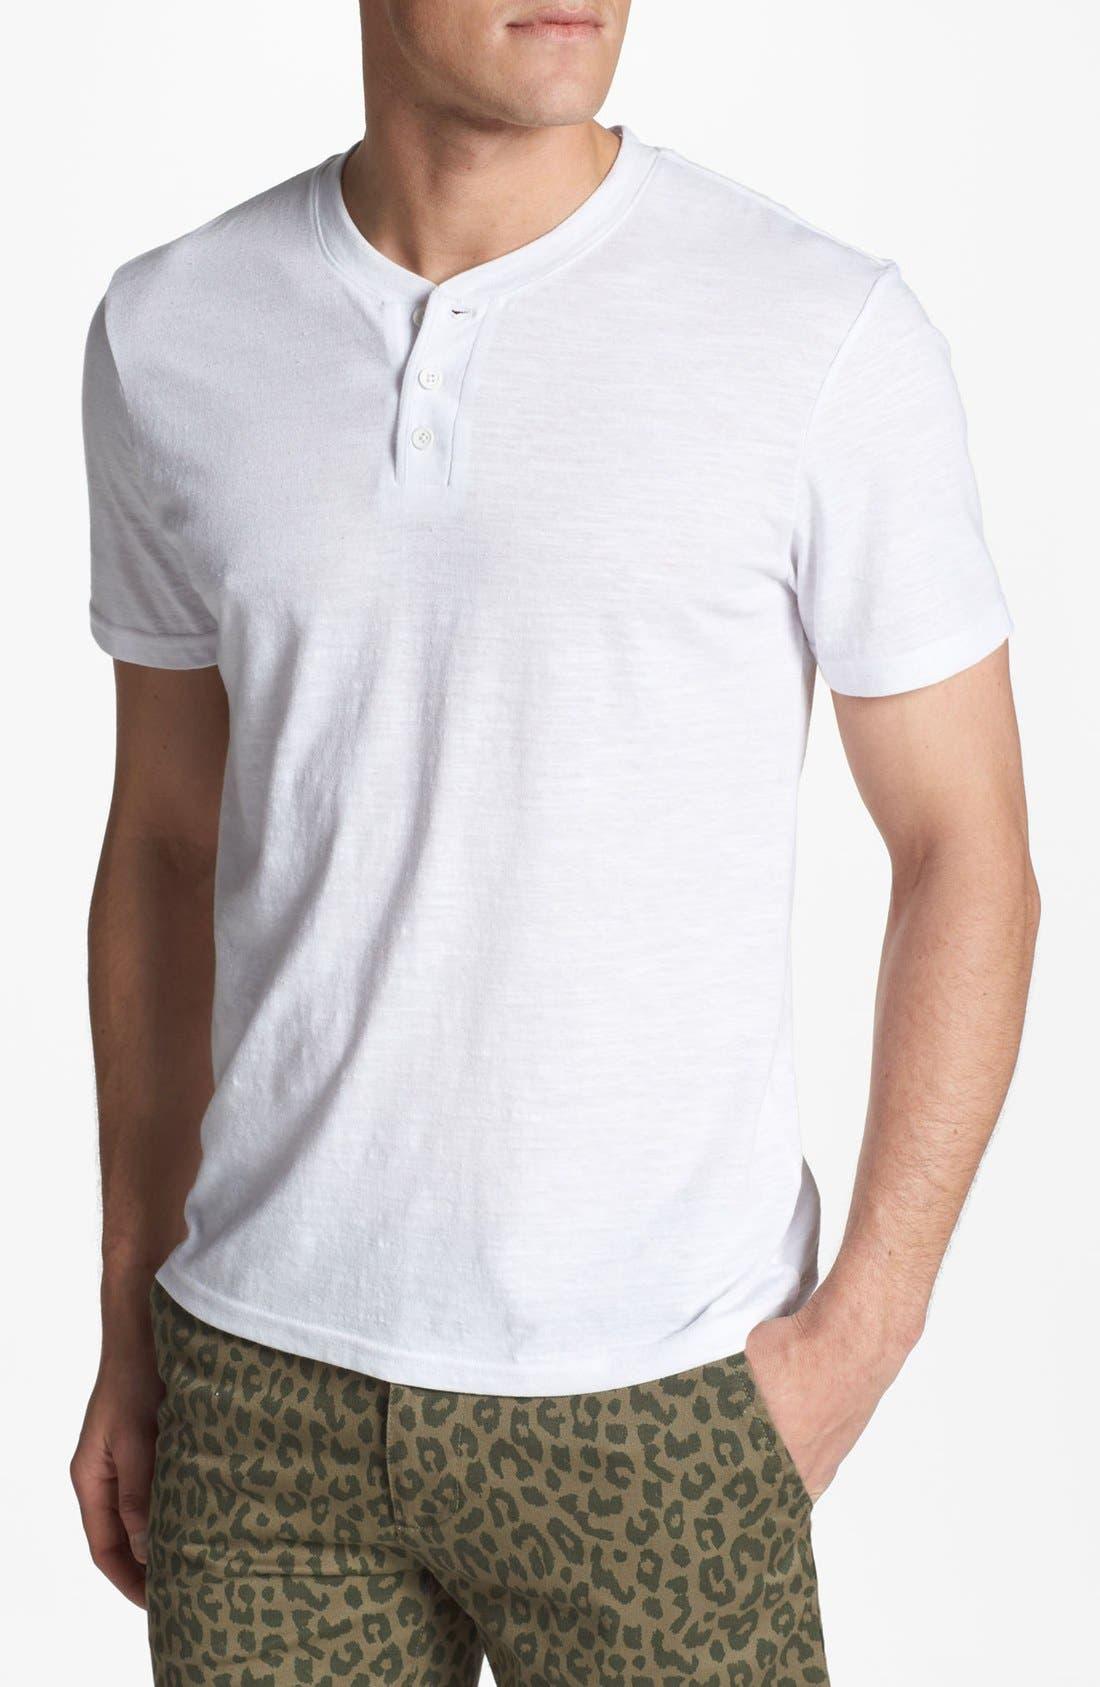 Main Image - The Rail 'Mock Twist' Henley T-Shirt